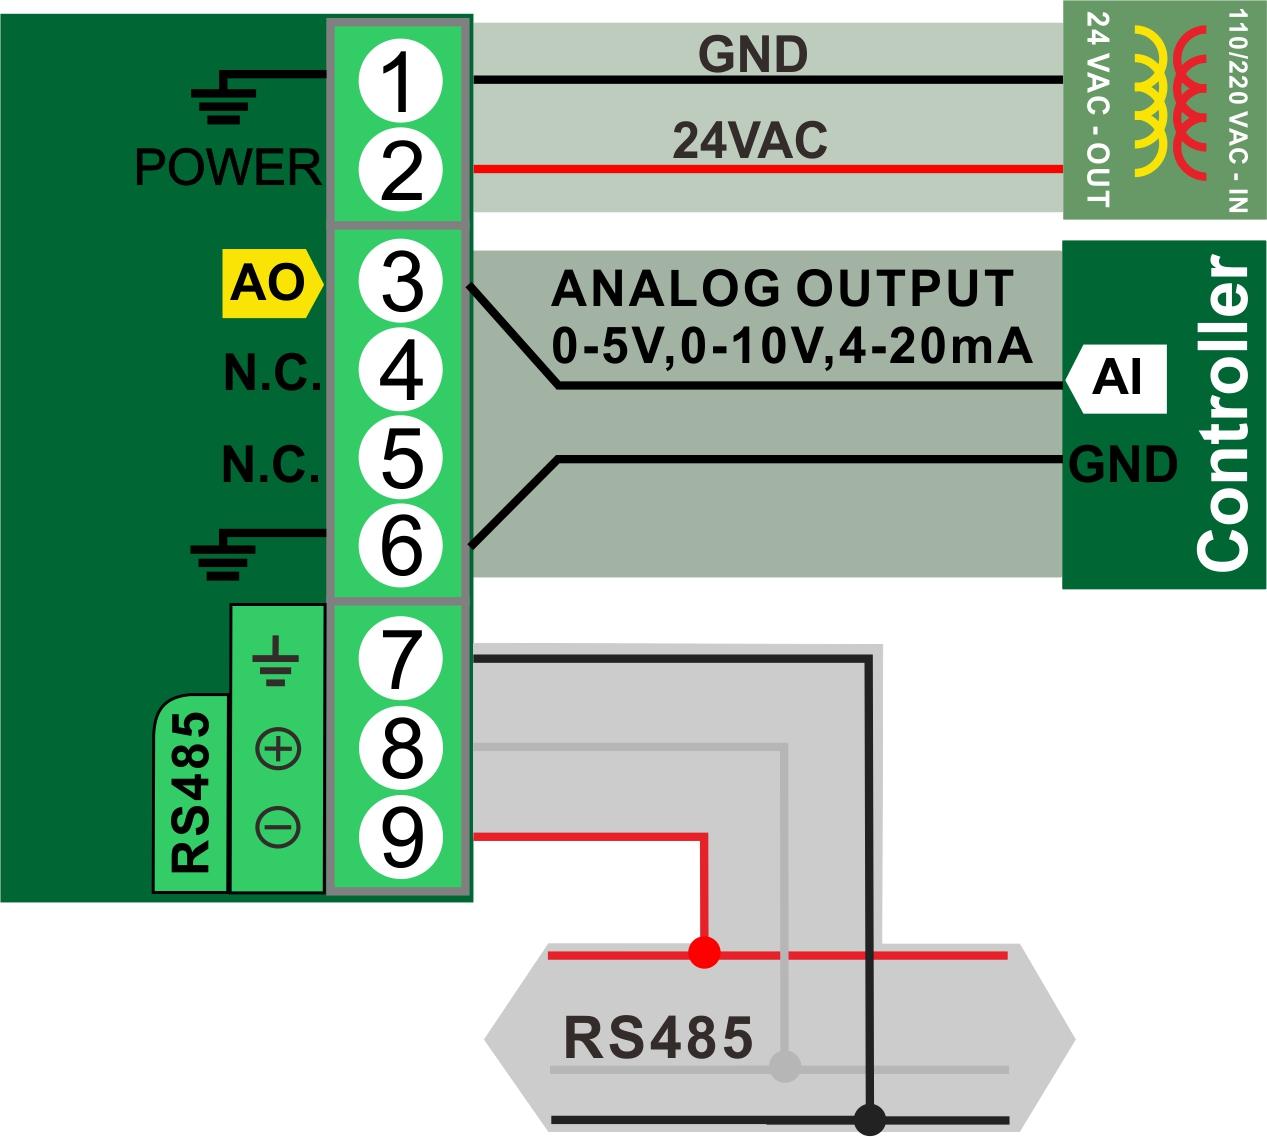 Pressure Wiring 2 pressure sensor bravo controls 4-20ma pressure transducer wiring diagram at creativeand.co